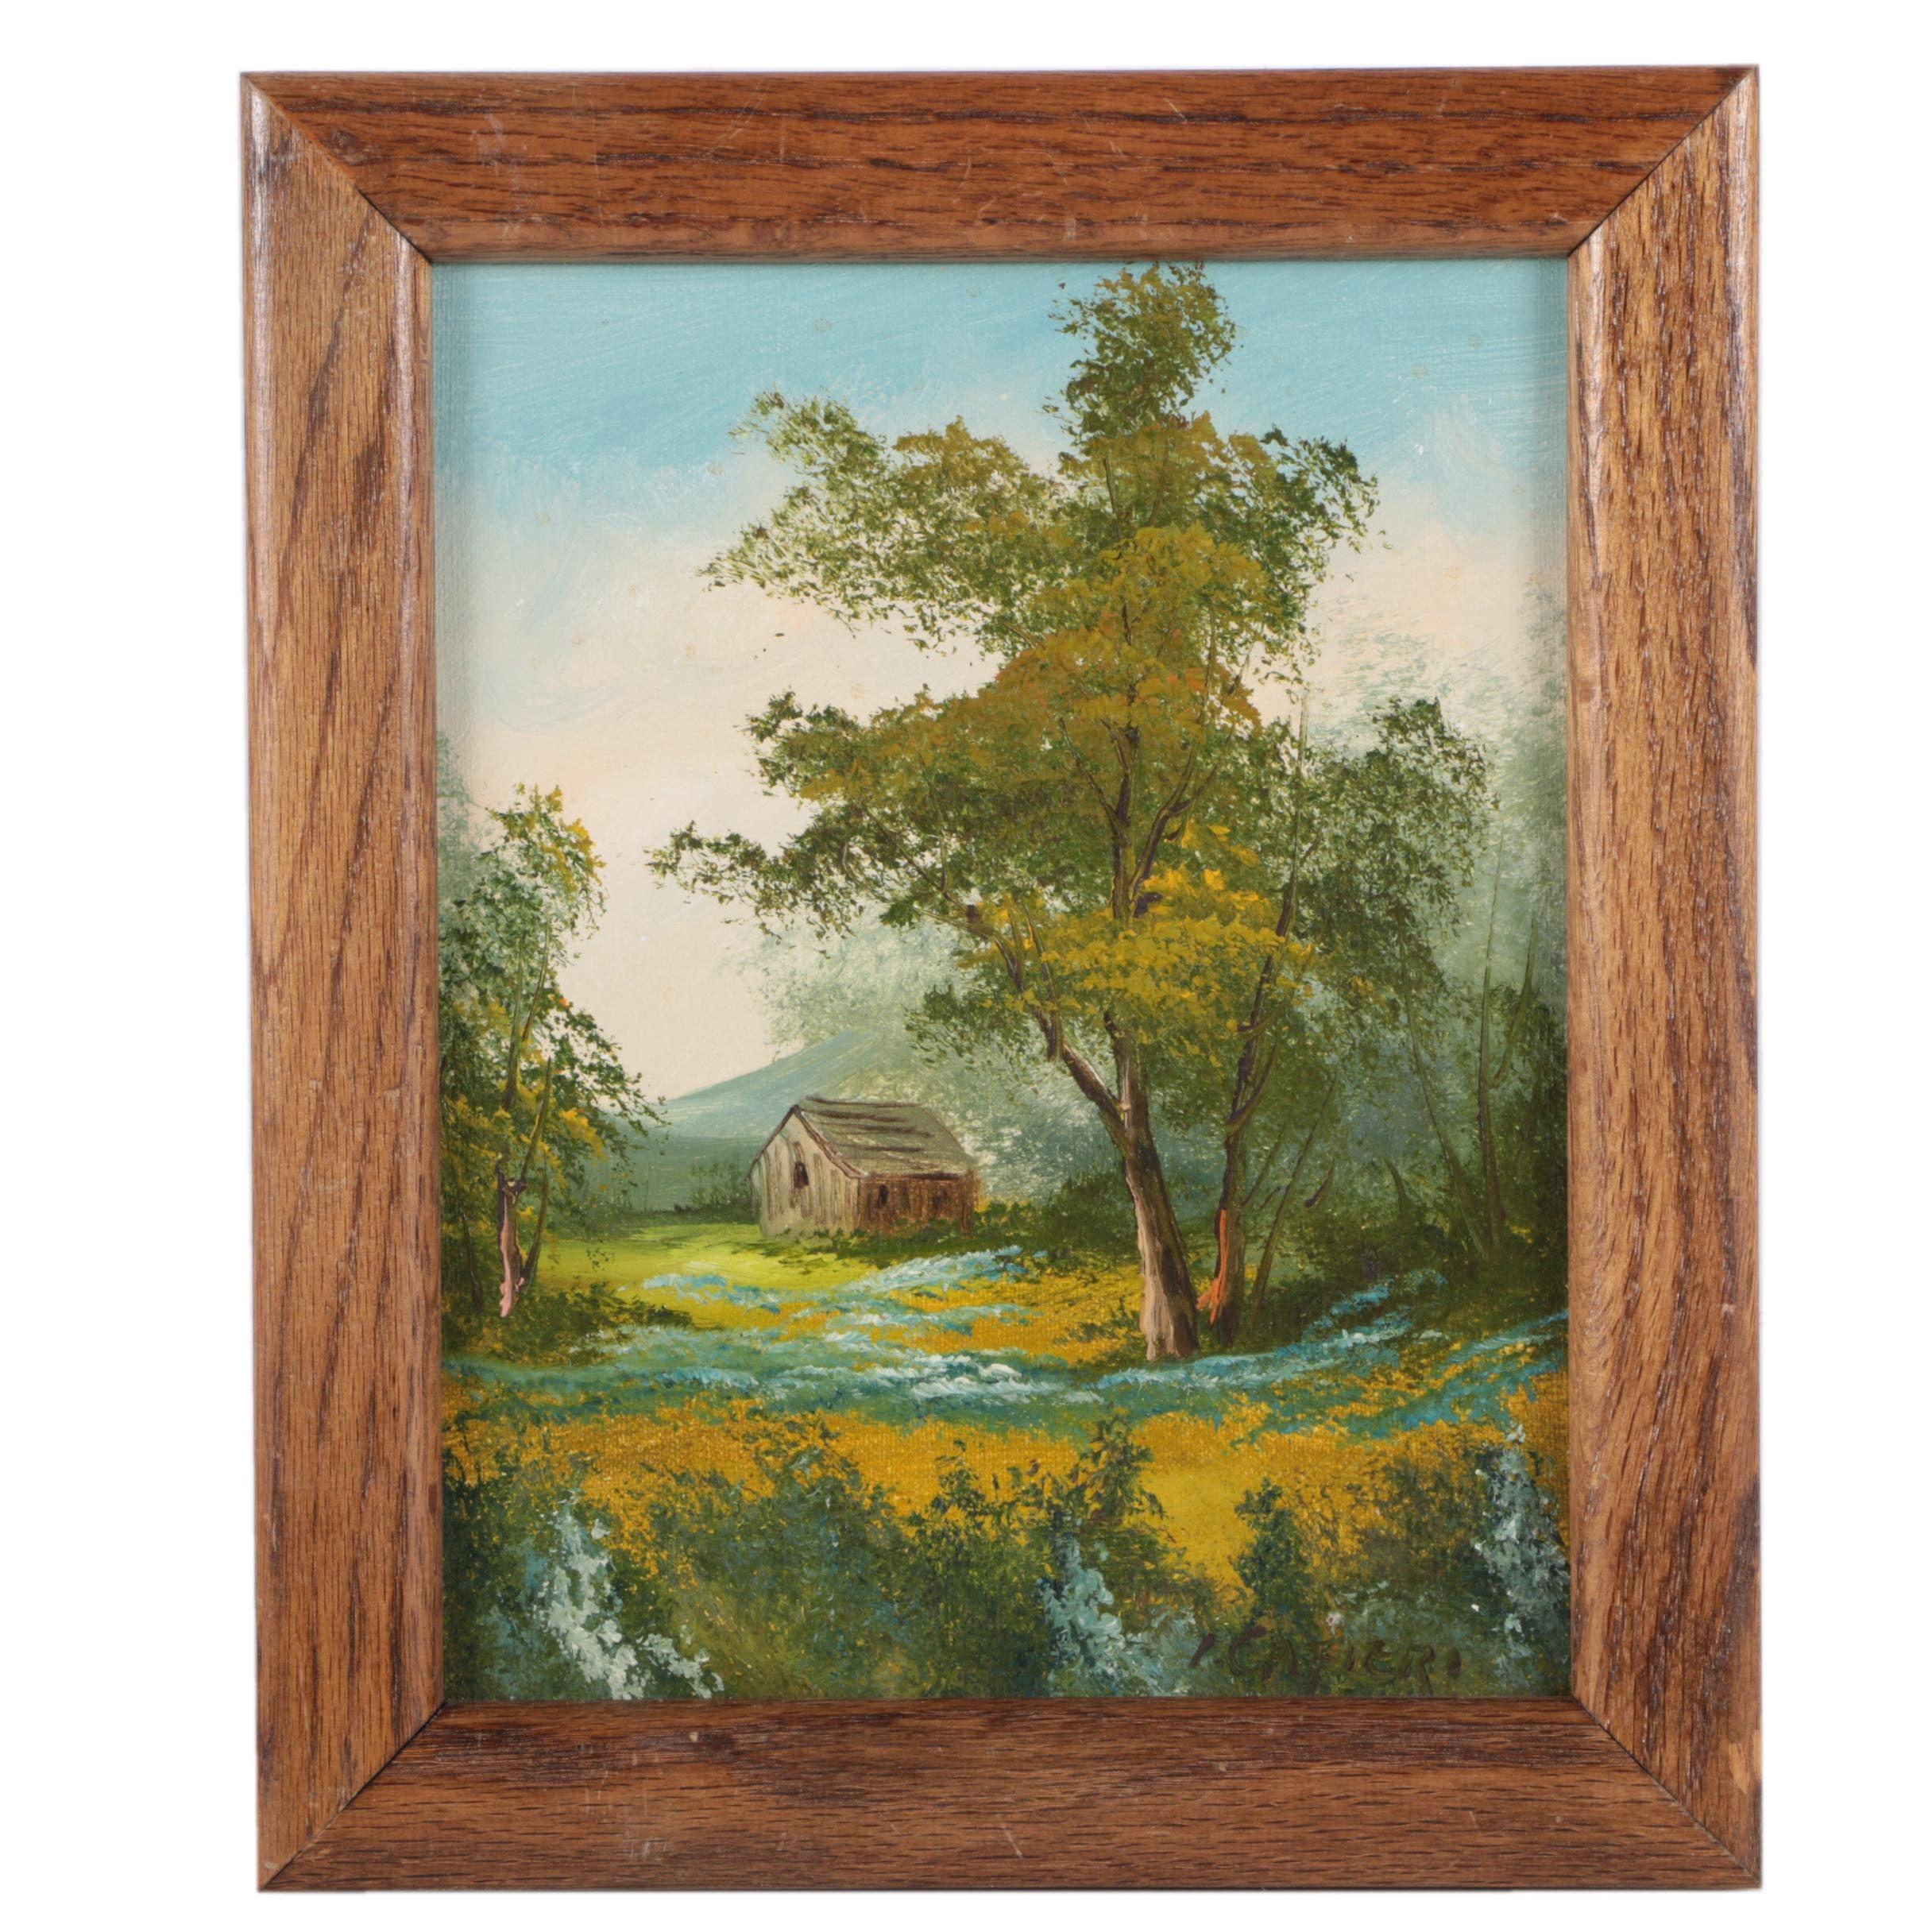 I. Cafieri Oil Painting on Canvas Landscape